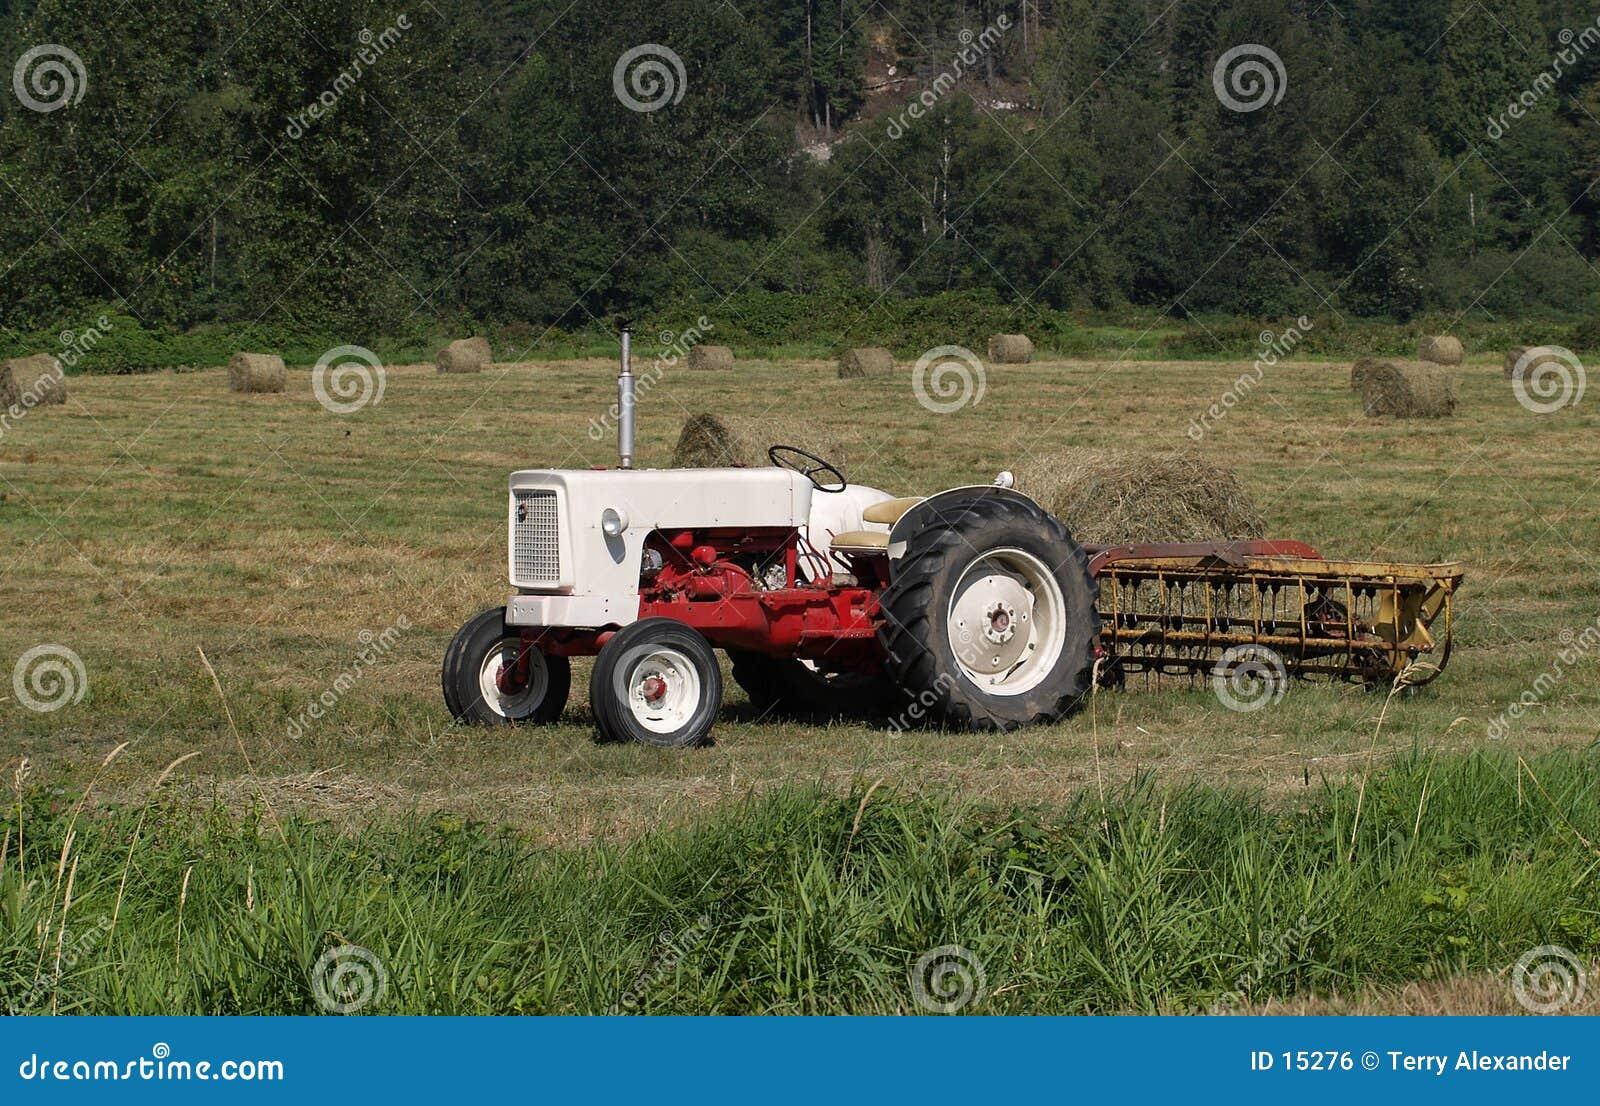 Tractor in hay field